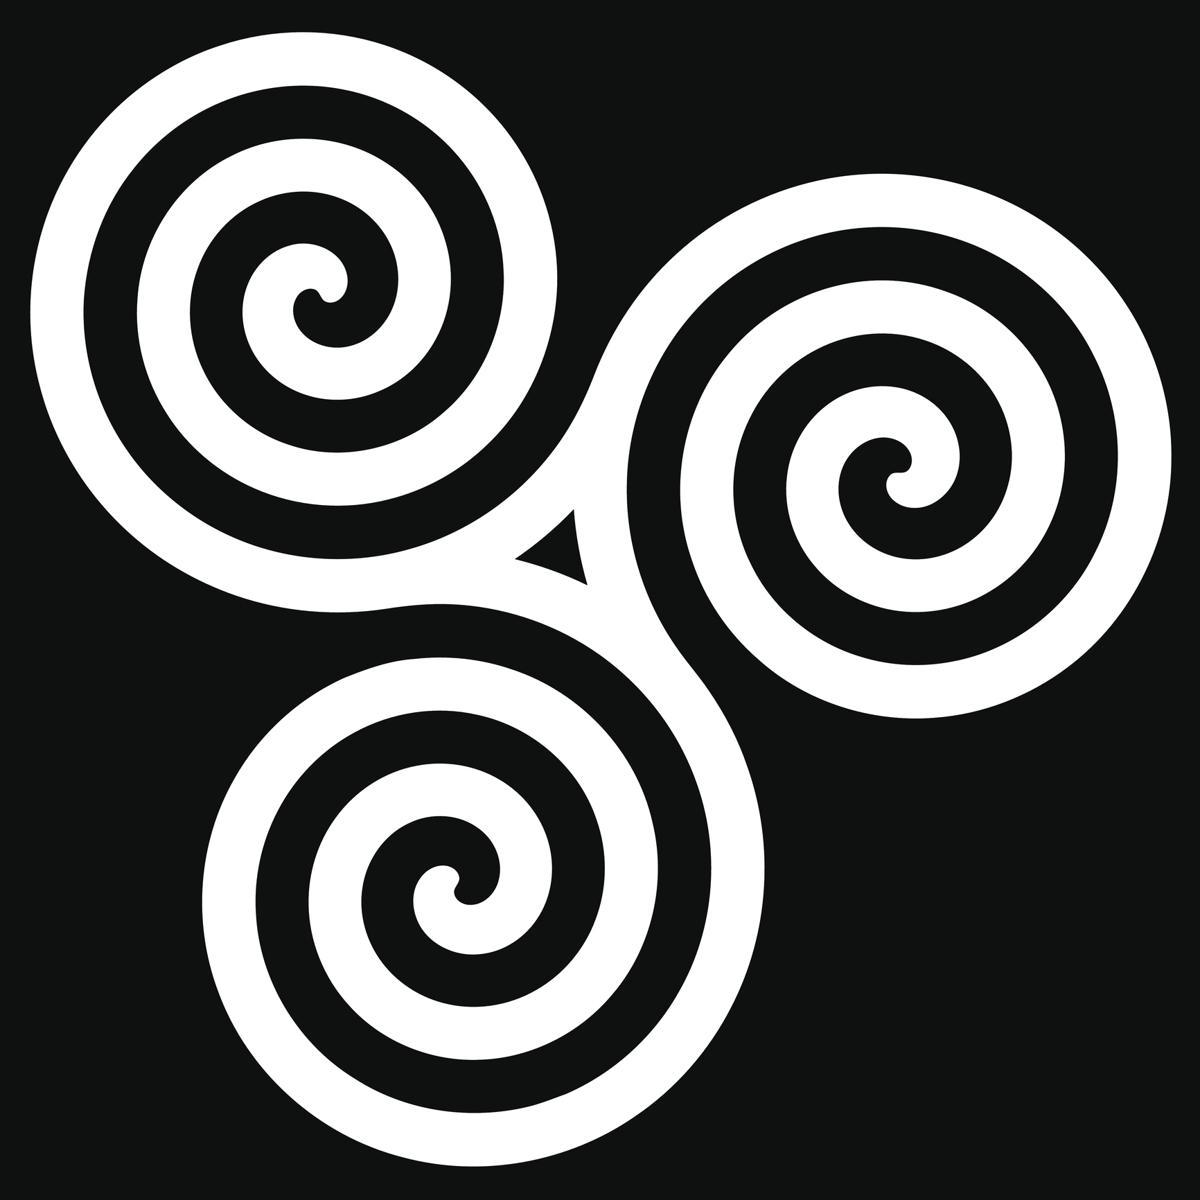 Paganism SymbolsSymbols